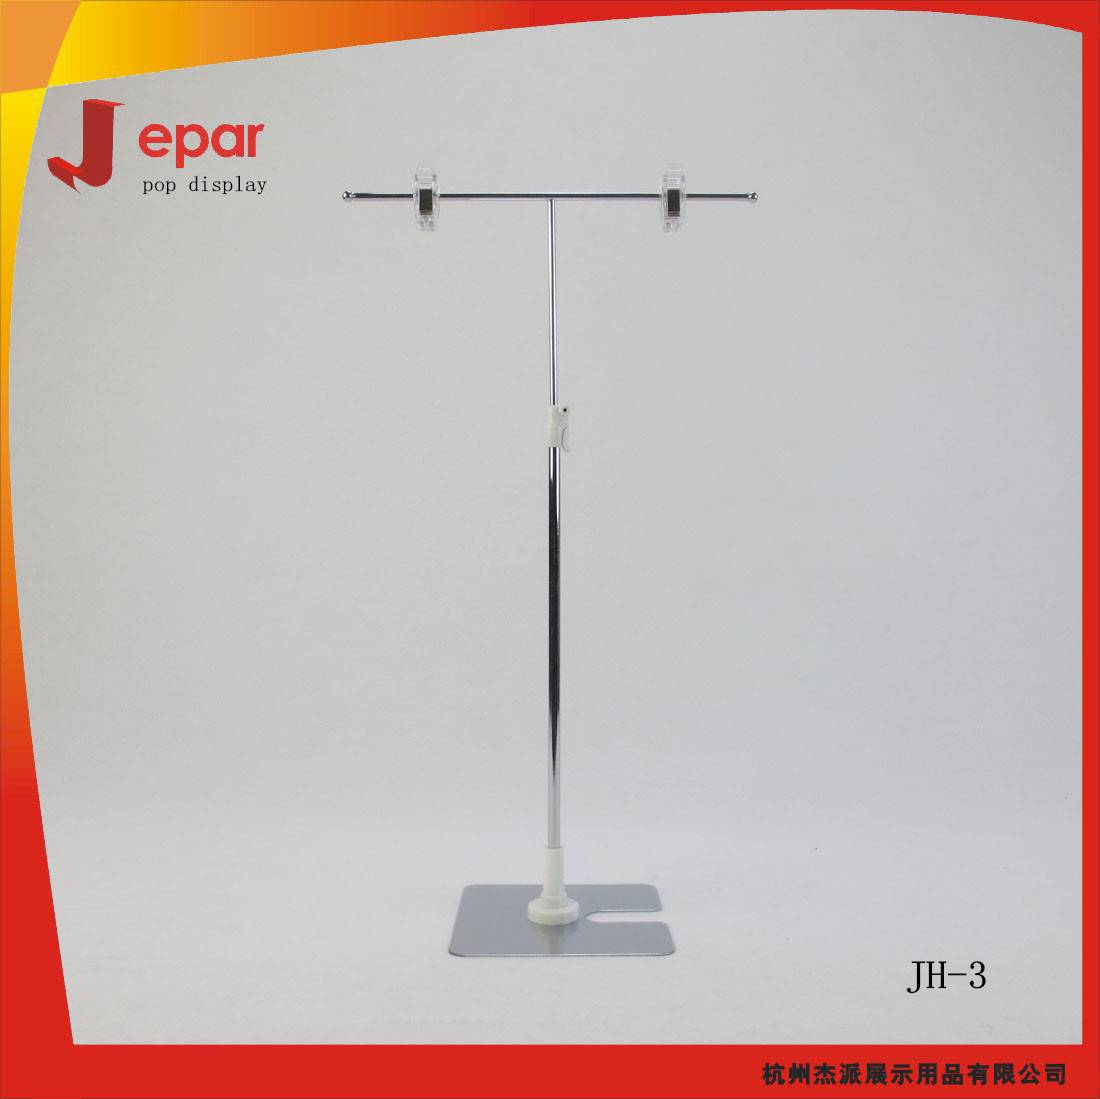 Metal adjustable tabletop poster display stand